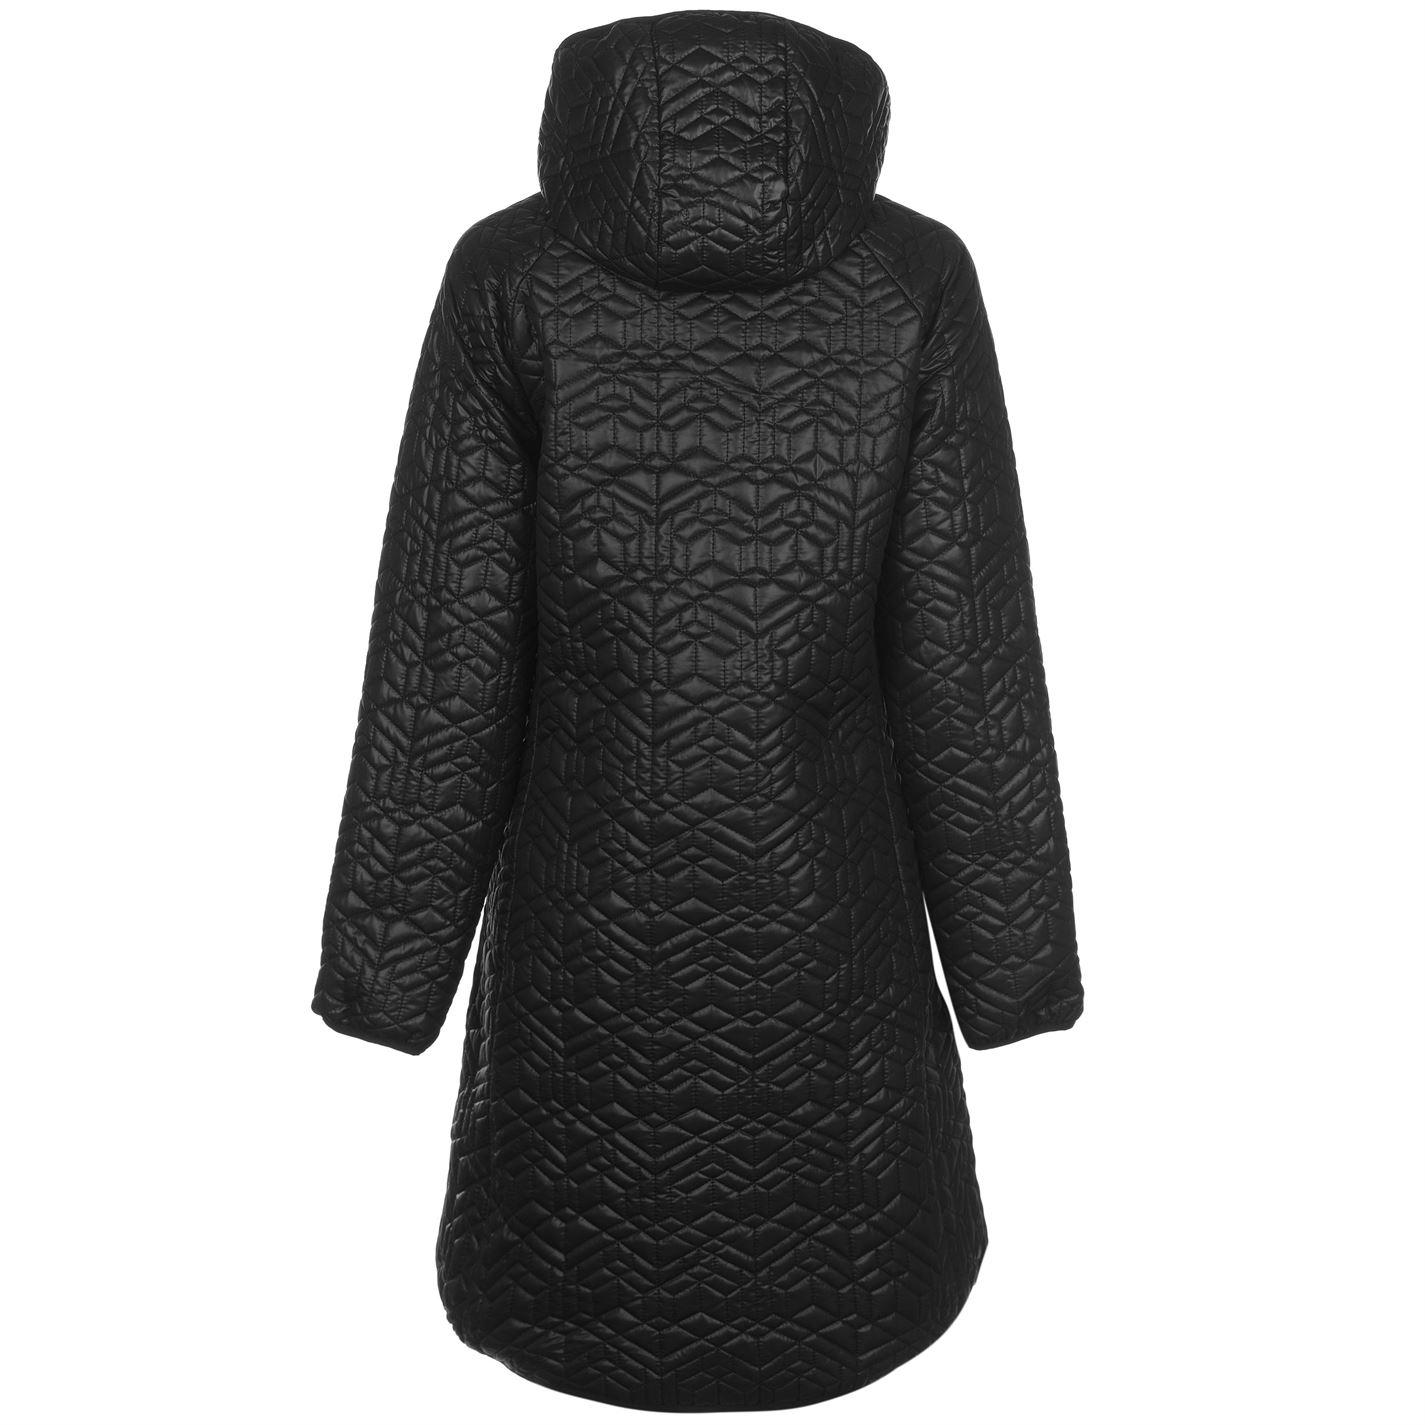 Top Quiltcoat Pro Usa Womens Quiltet Parka Heritage Langermet Jacket FqR1Hpw0